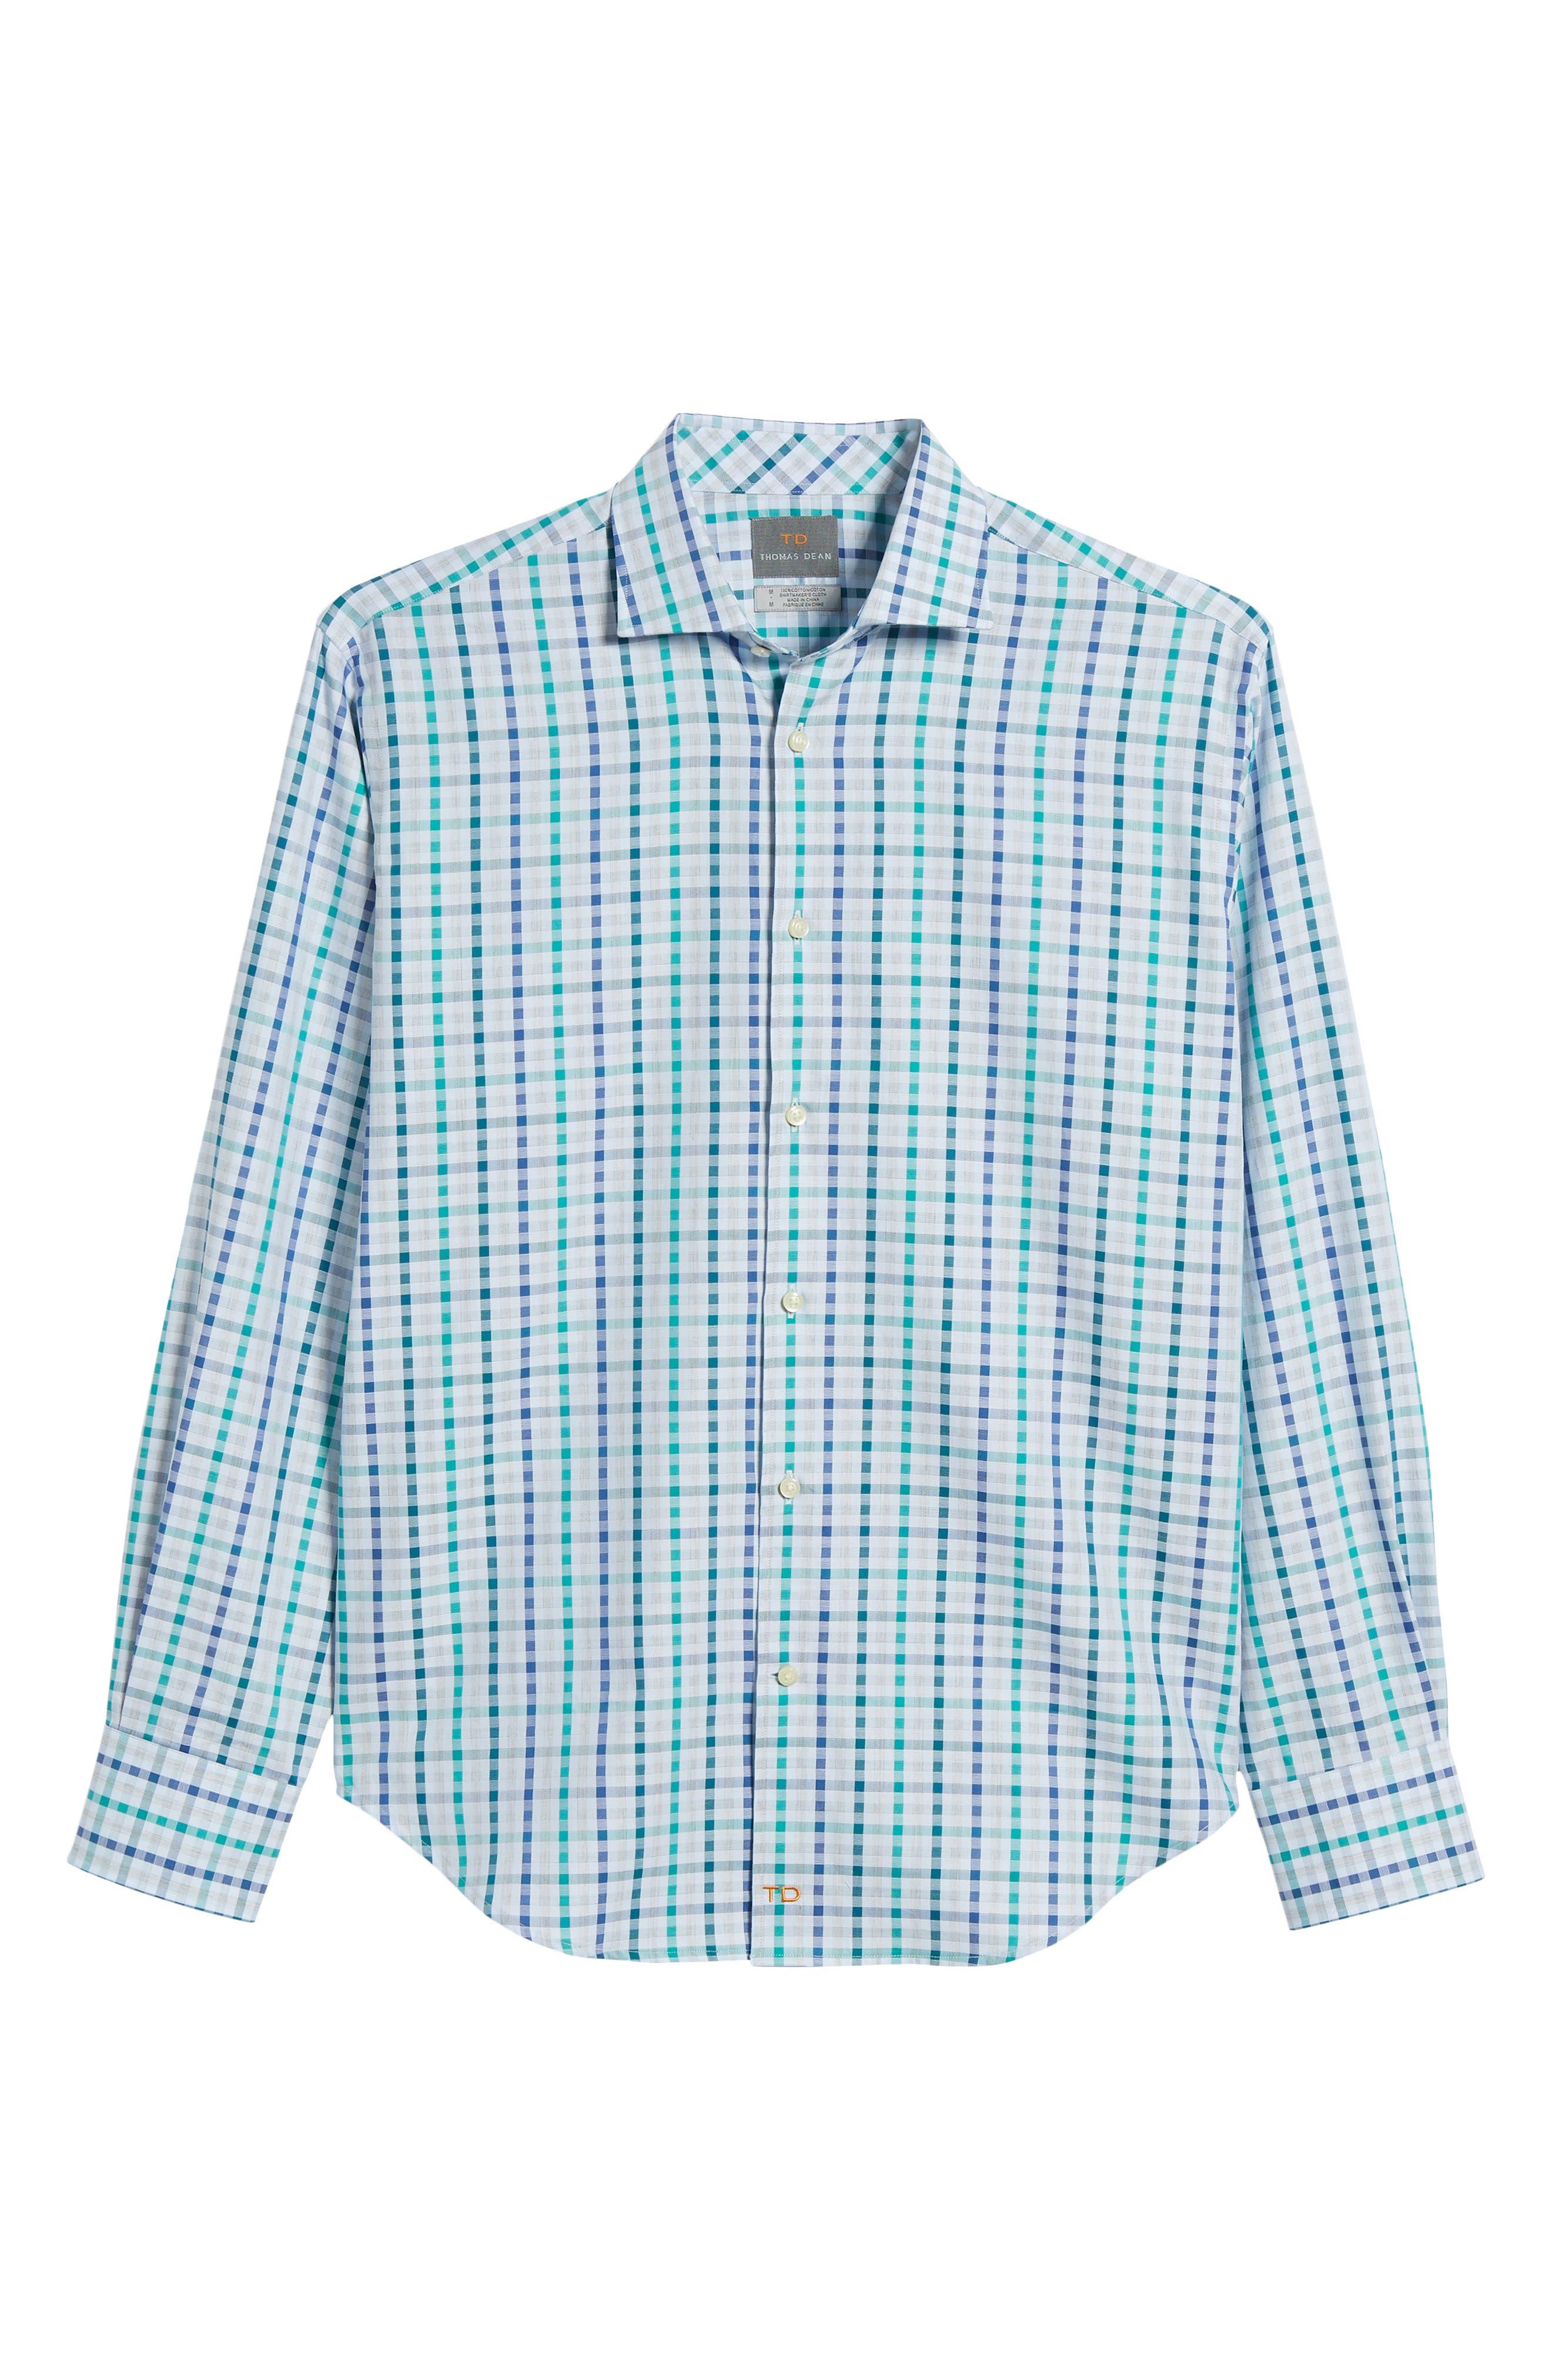 Regular Fit Check Sport Shirt,                             Alternate thumbnail 6, color,                             300